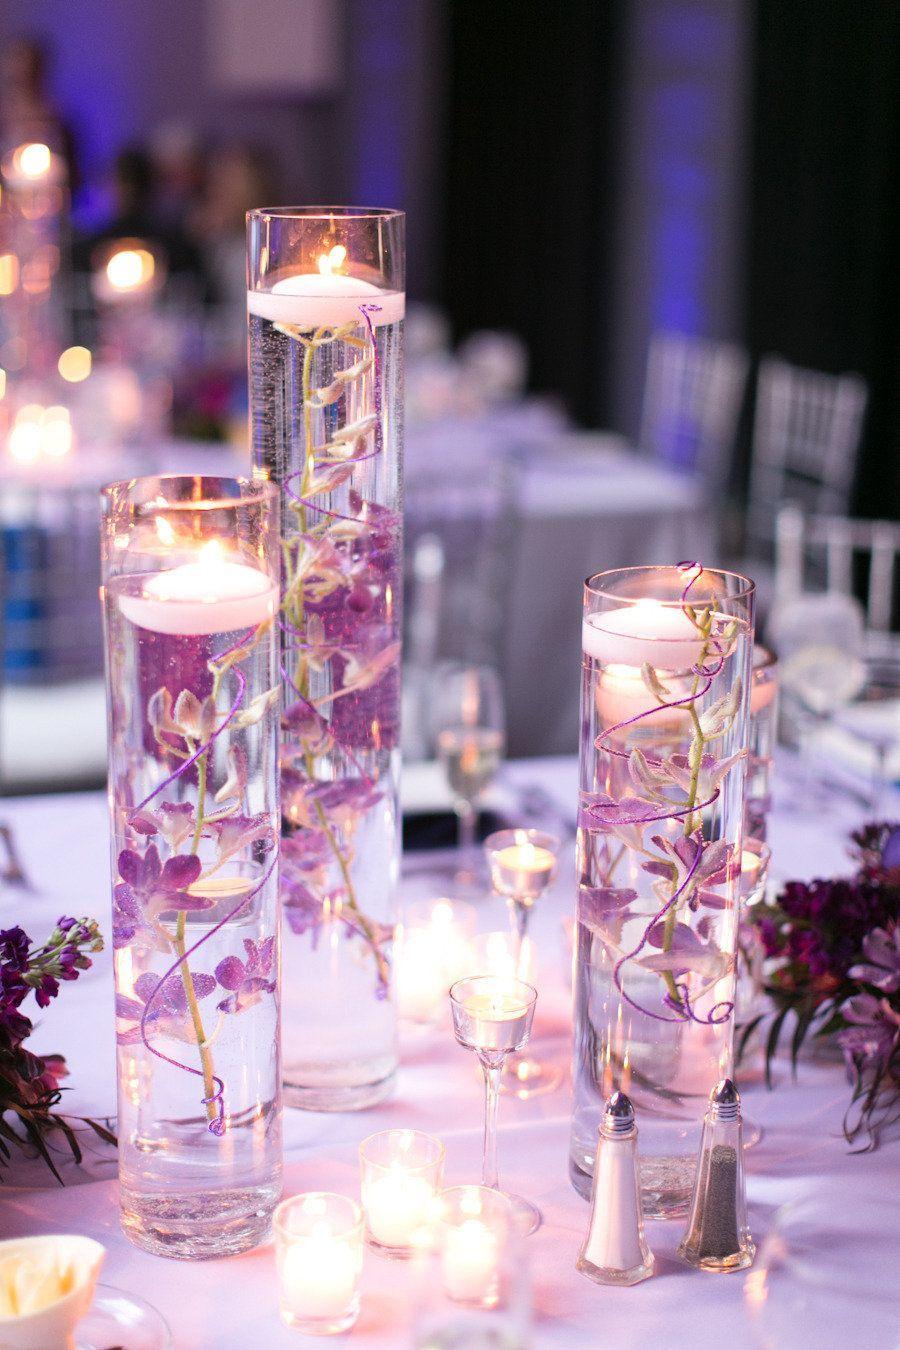 Milwaukee Wedding from Heather Cook Elliott Photography#cook #elliott #heather #milwaukee #photography #wedding